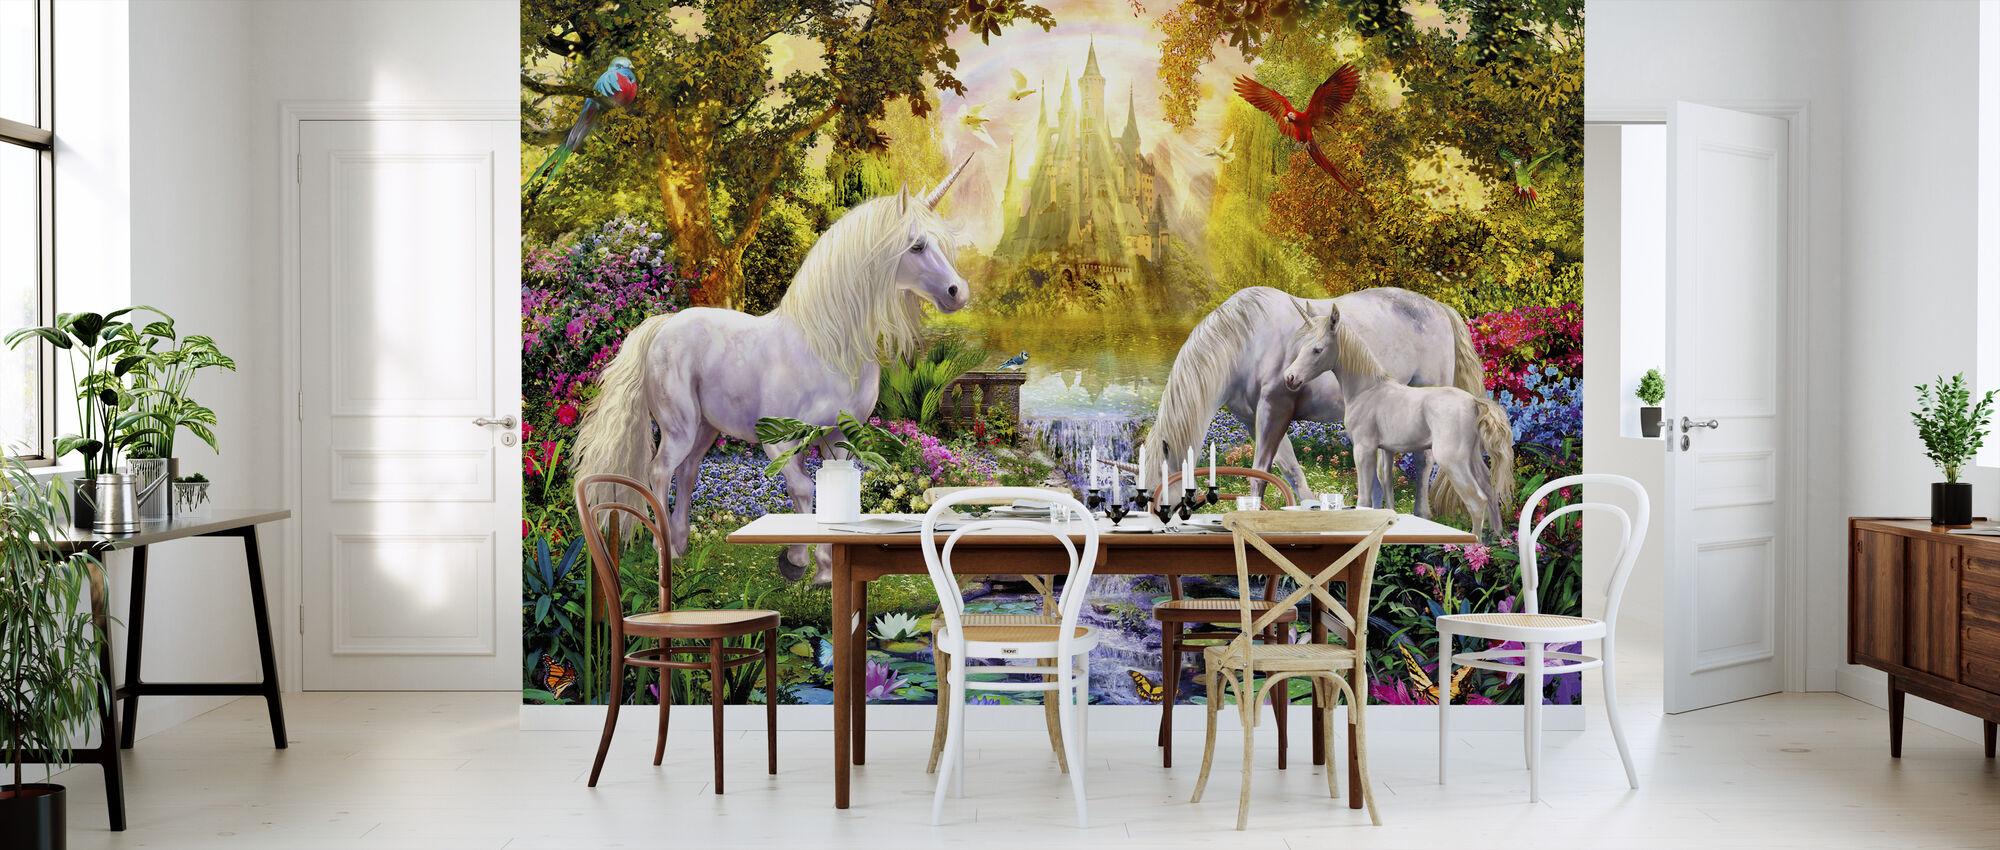 The Castle Unicorn Garden - Wallpaper - Kitchen